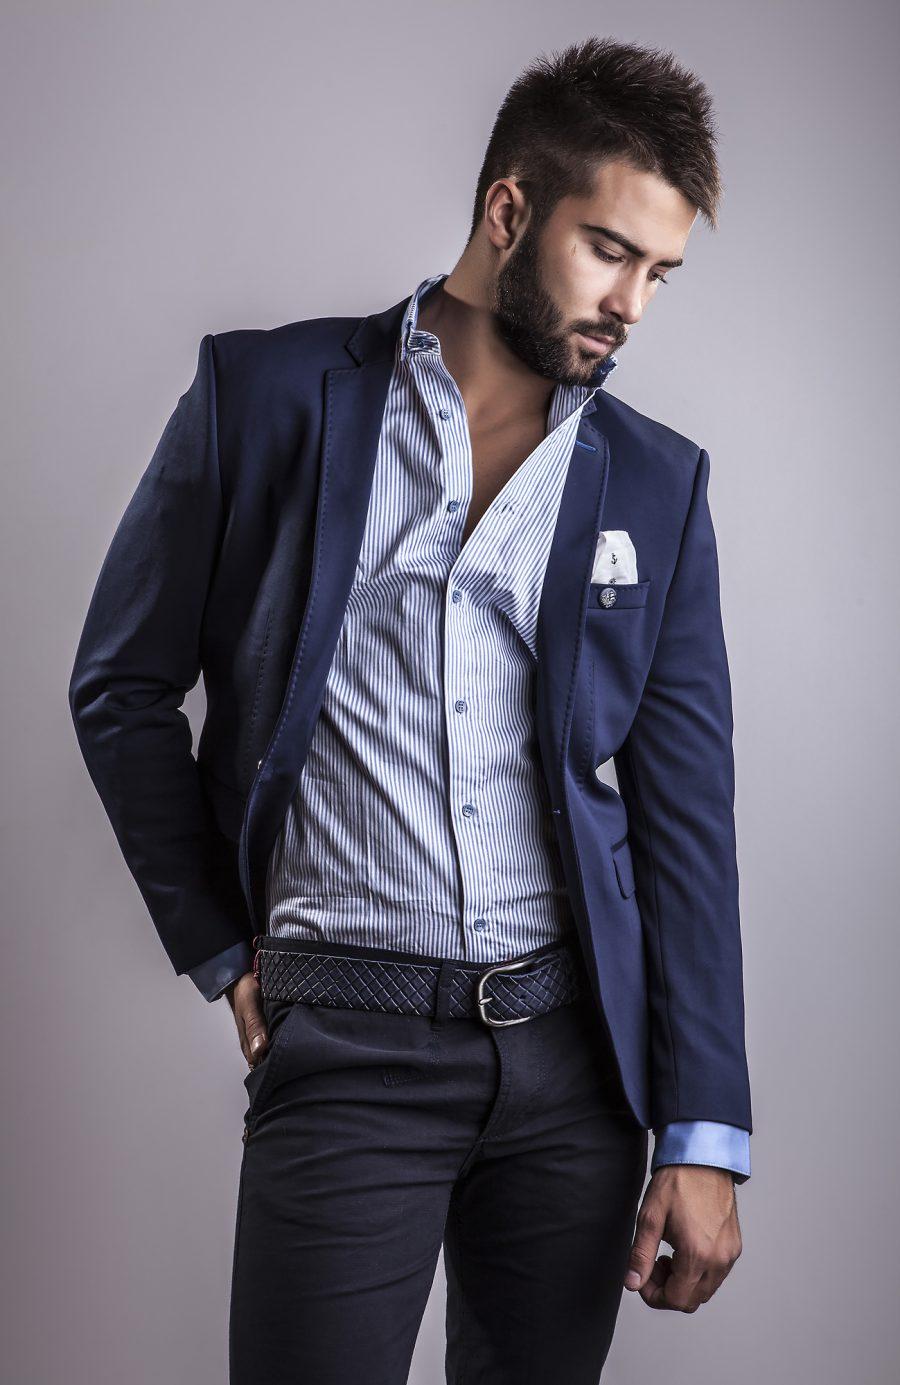 Male Model Mens Modern Suit Style